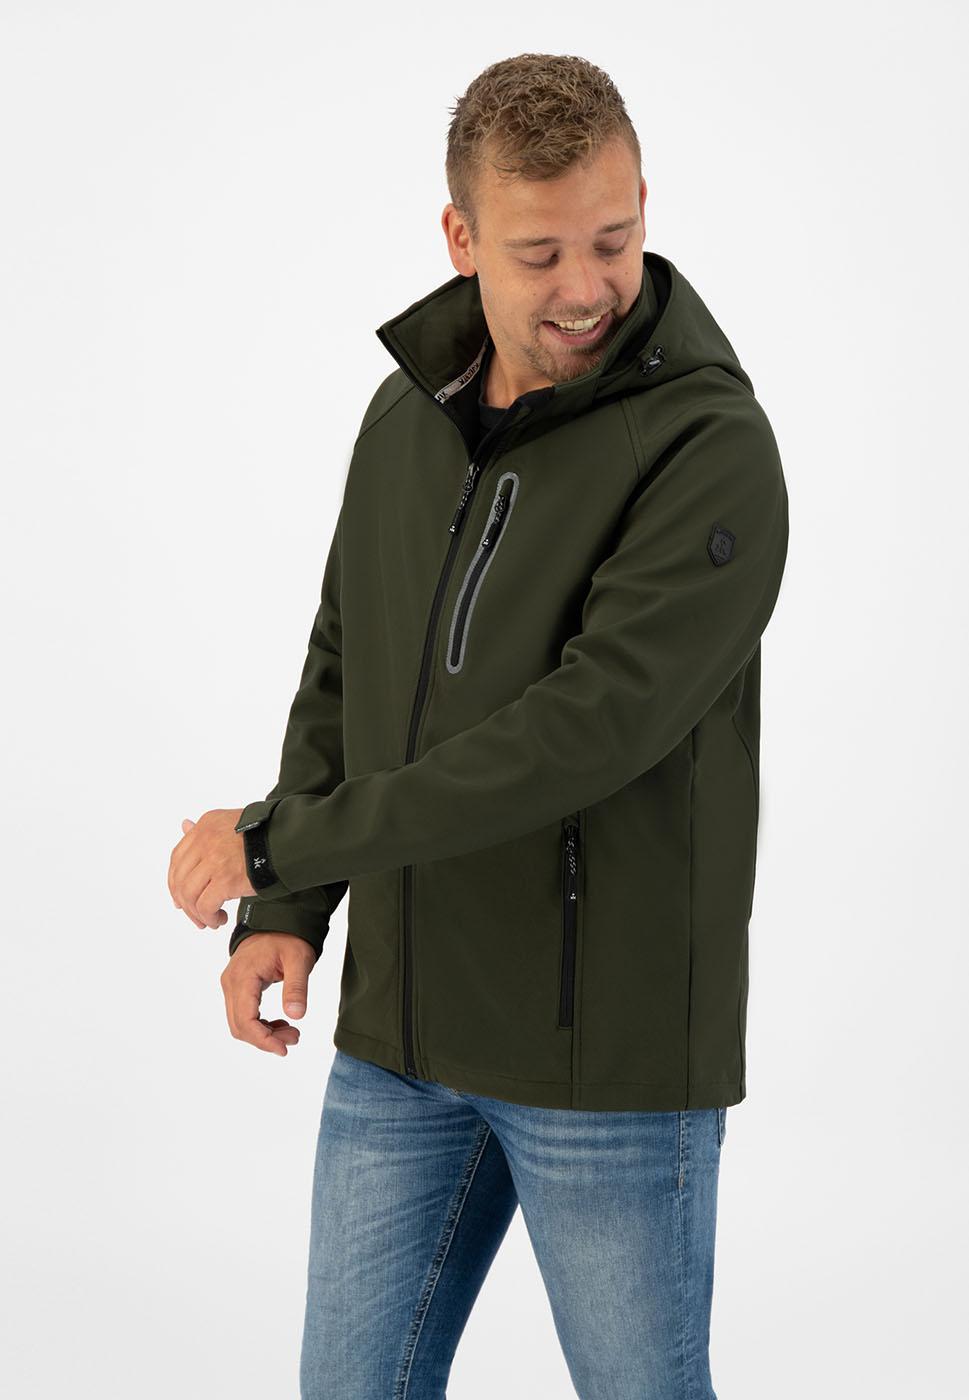 Kjelvik Scandinavian Clothing - Men Softshell Kevan Green